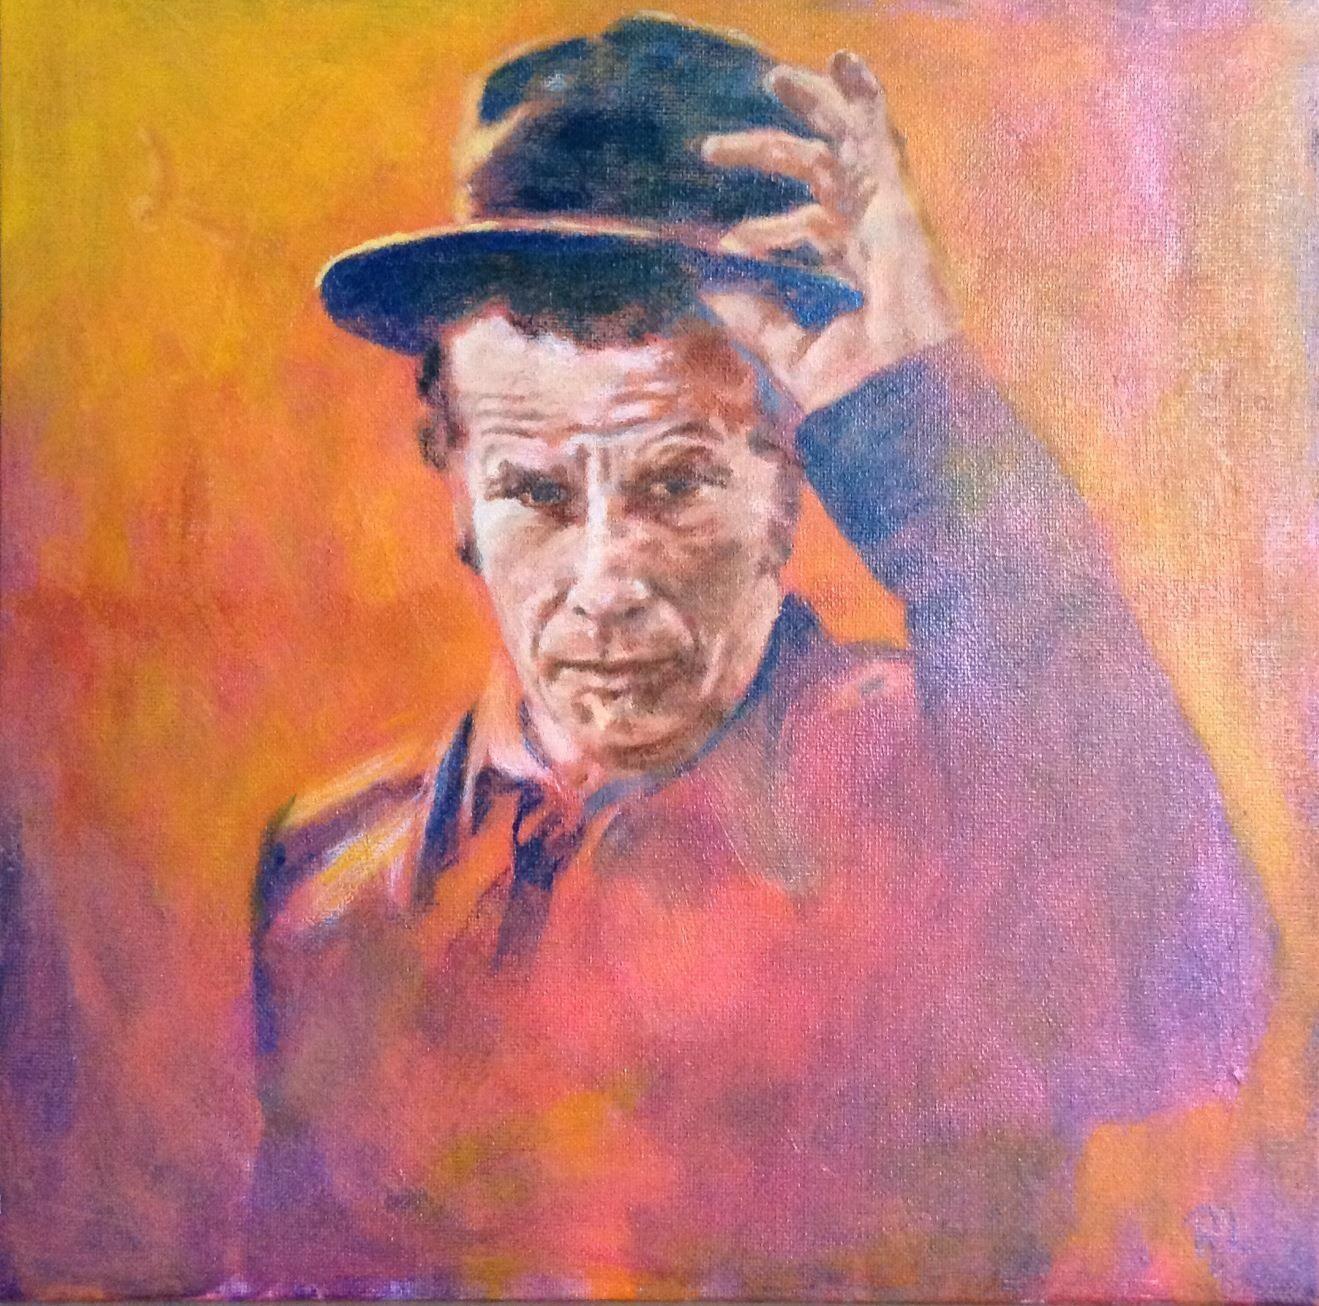 #Tom Waits  #acrylic on canvas #30x30 #rithva